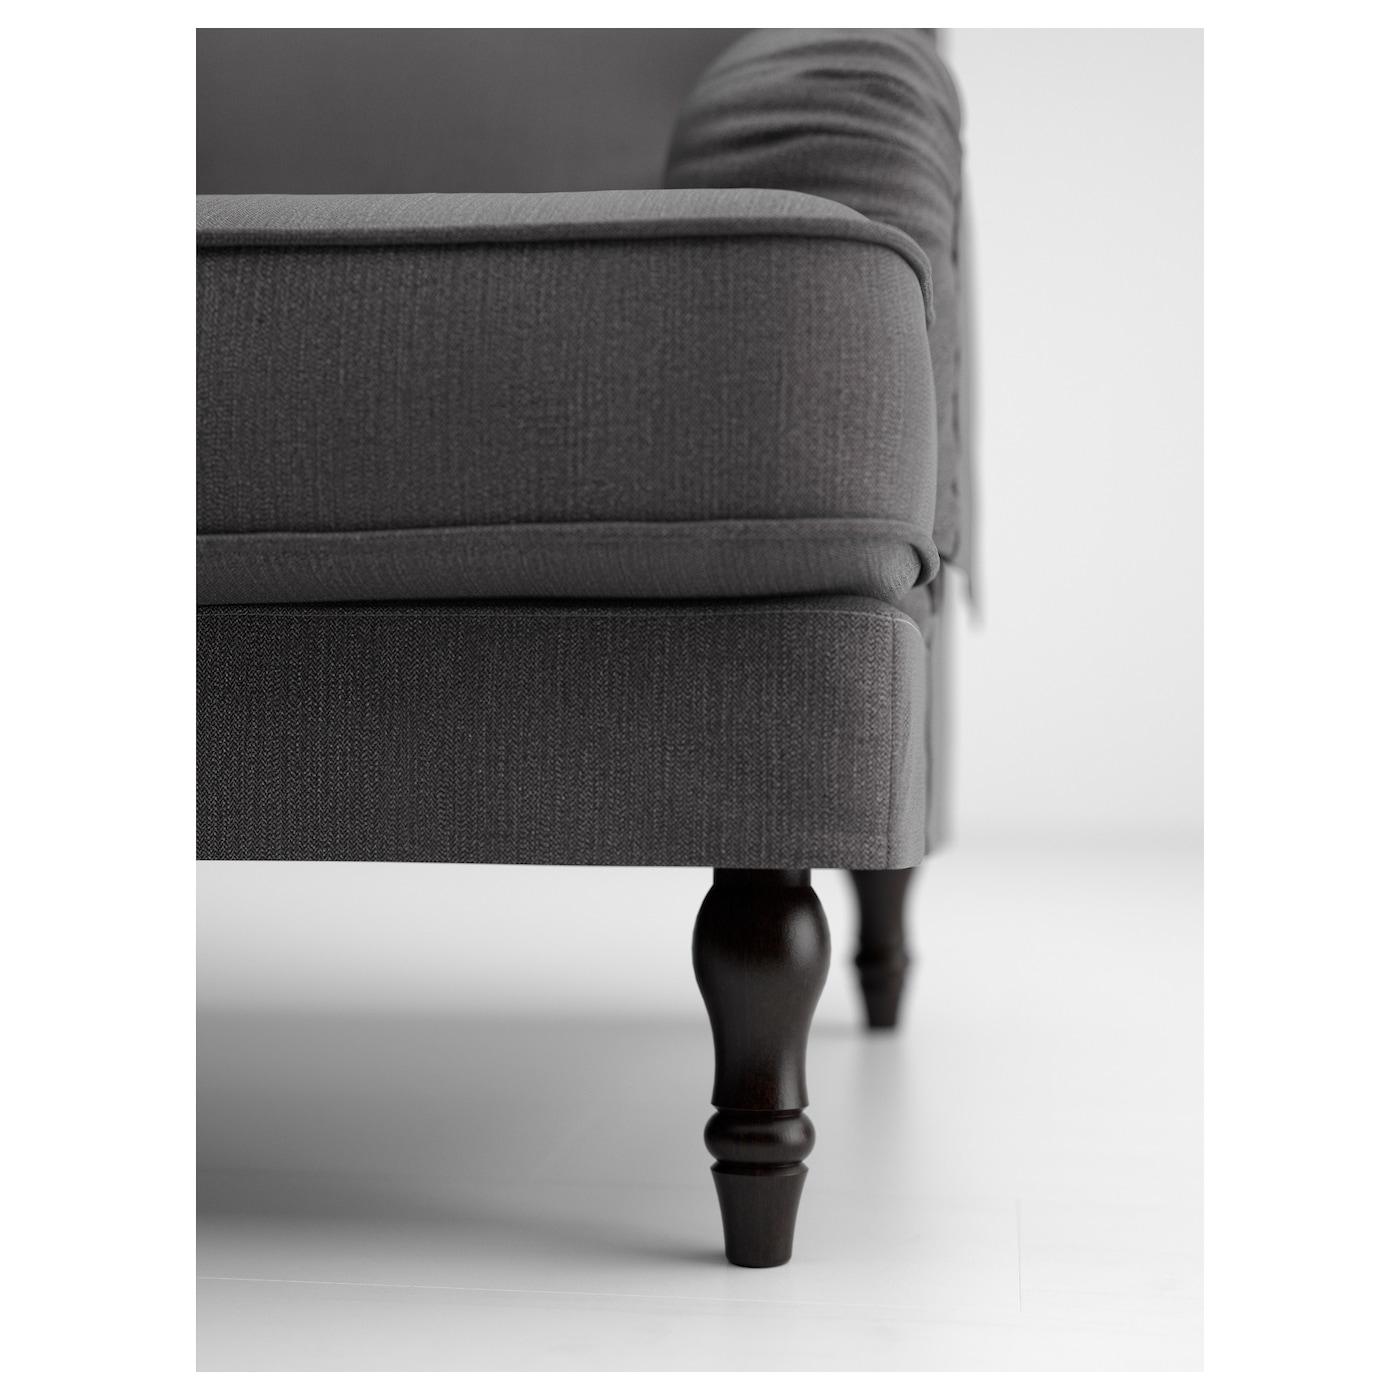 Recamiere ikea stocksund  STOCKSUND Legs f armch/chaise-longue/sofas Black - IKEA